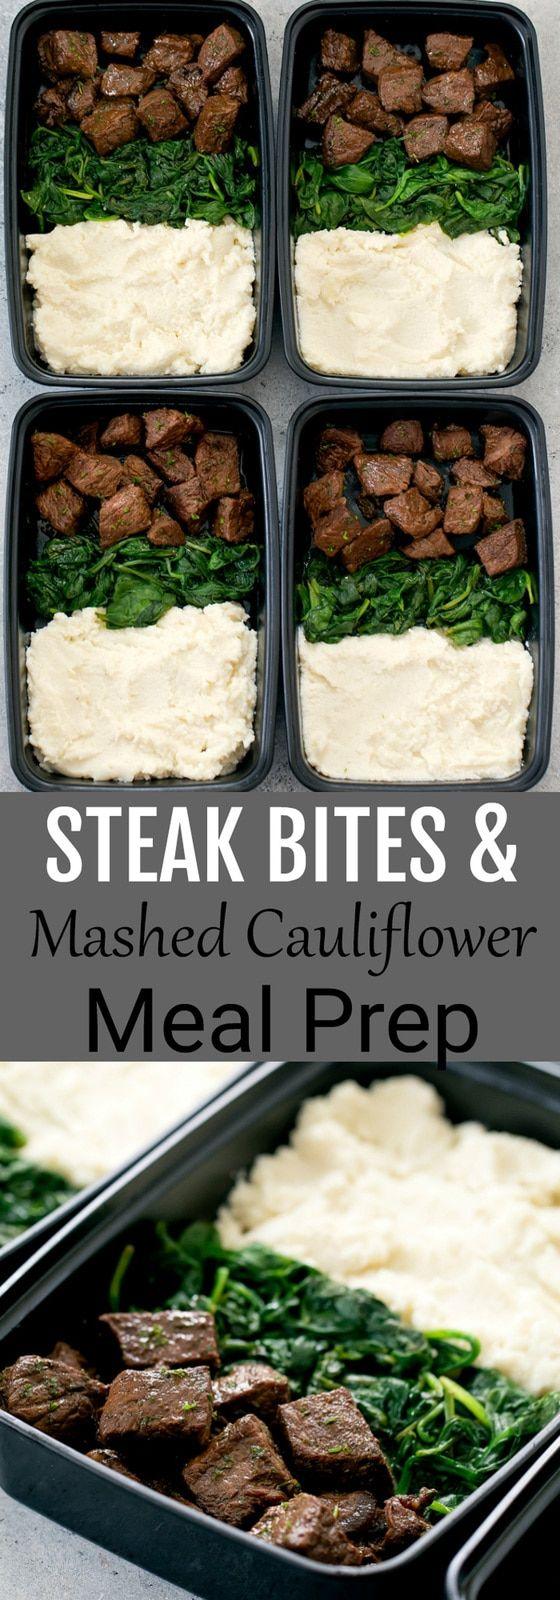 Steak Bites with Mashed Cauliflower Meal Prep